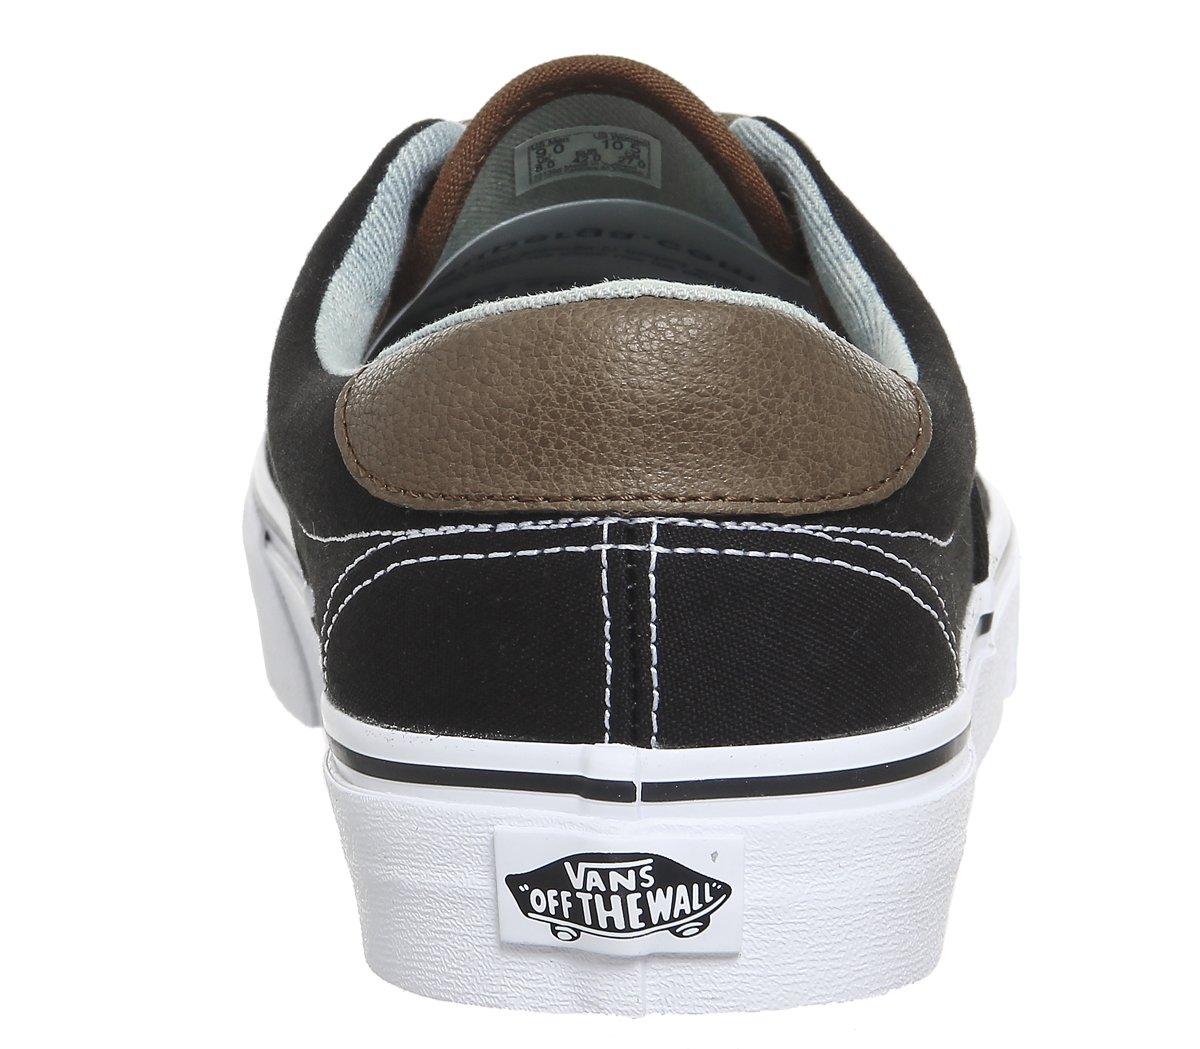 Vans Mens Era 59 (C&L) Black/Acid Denim Denim Black/Acid Skateboarding Sneakers VN0A38FSQ (11.5 Women/10 Men M US, Black/Acid Denim) B074HCL3TM Fashion Sneakers 14e705